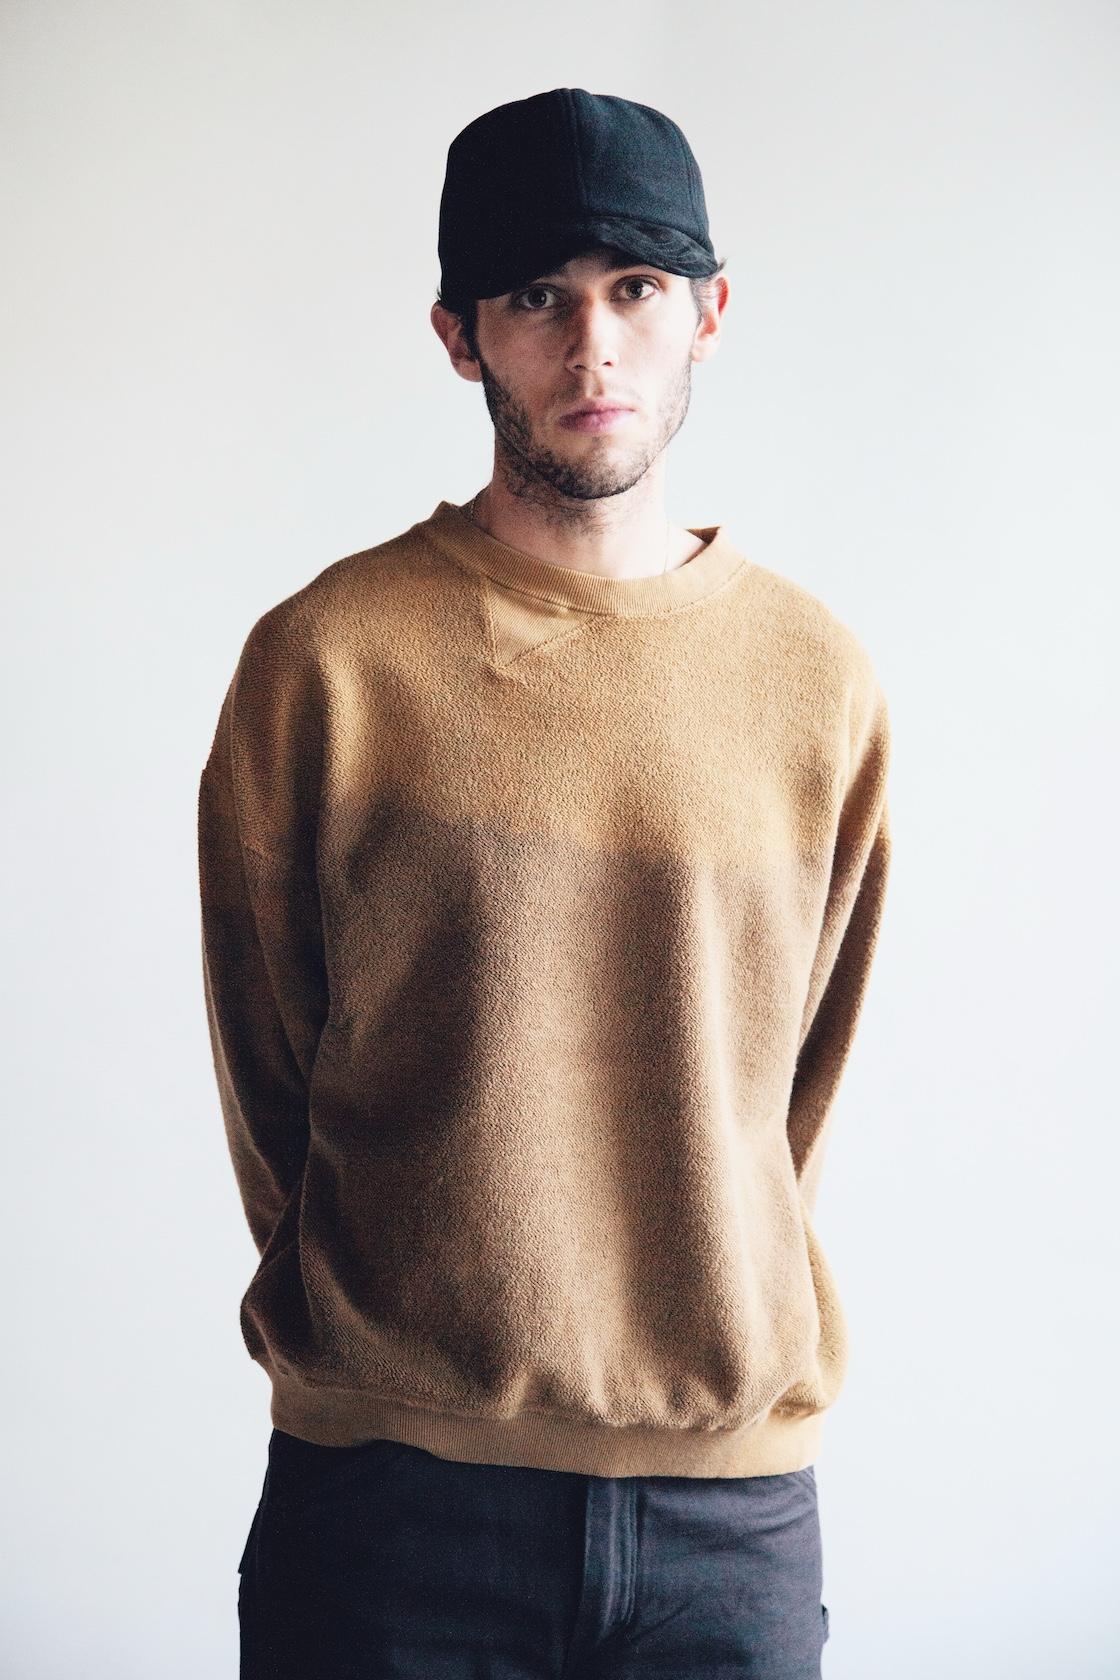 Hender scheme 2 tone wool cap, Noma t.d. breach twist sweatshirt, orslow canoe club painter pants on body